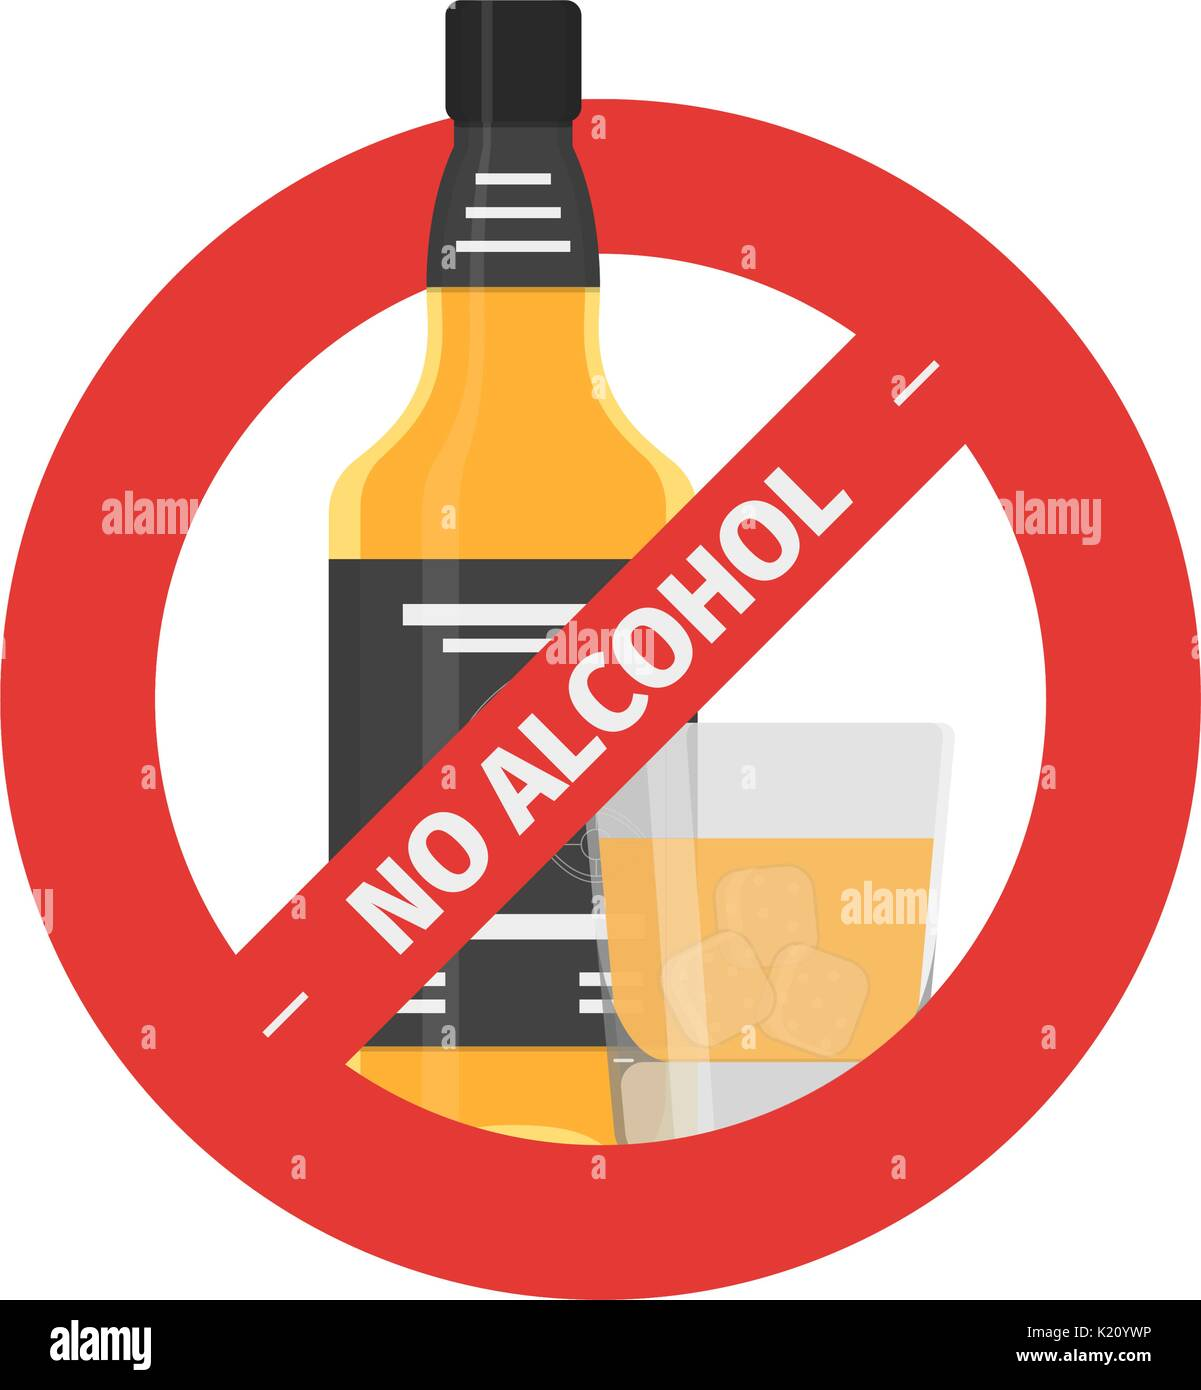 Alcohol Warning Label Stock Photos & Alcohol Warning Label ...